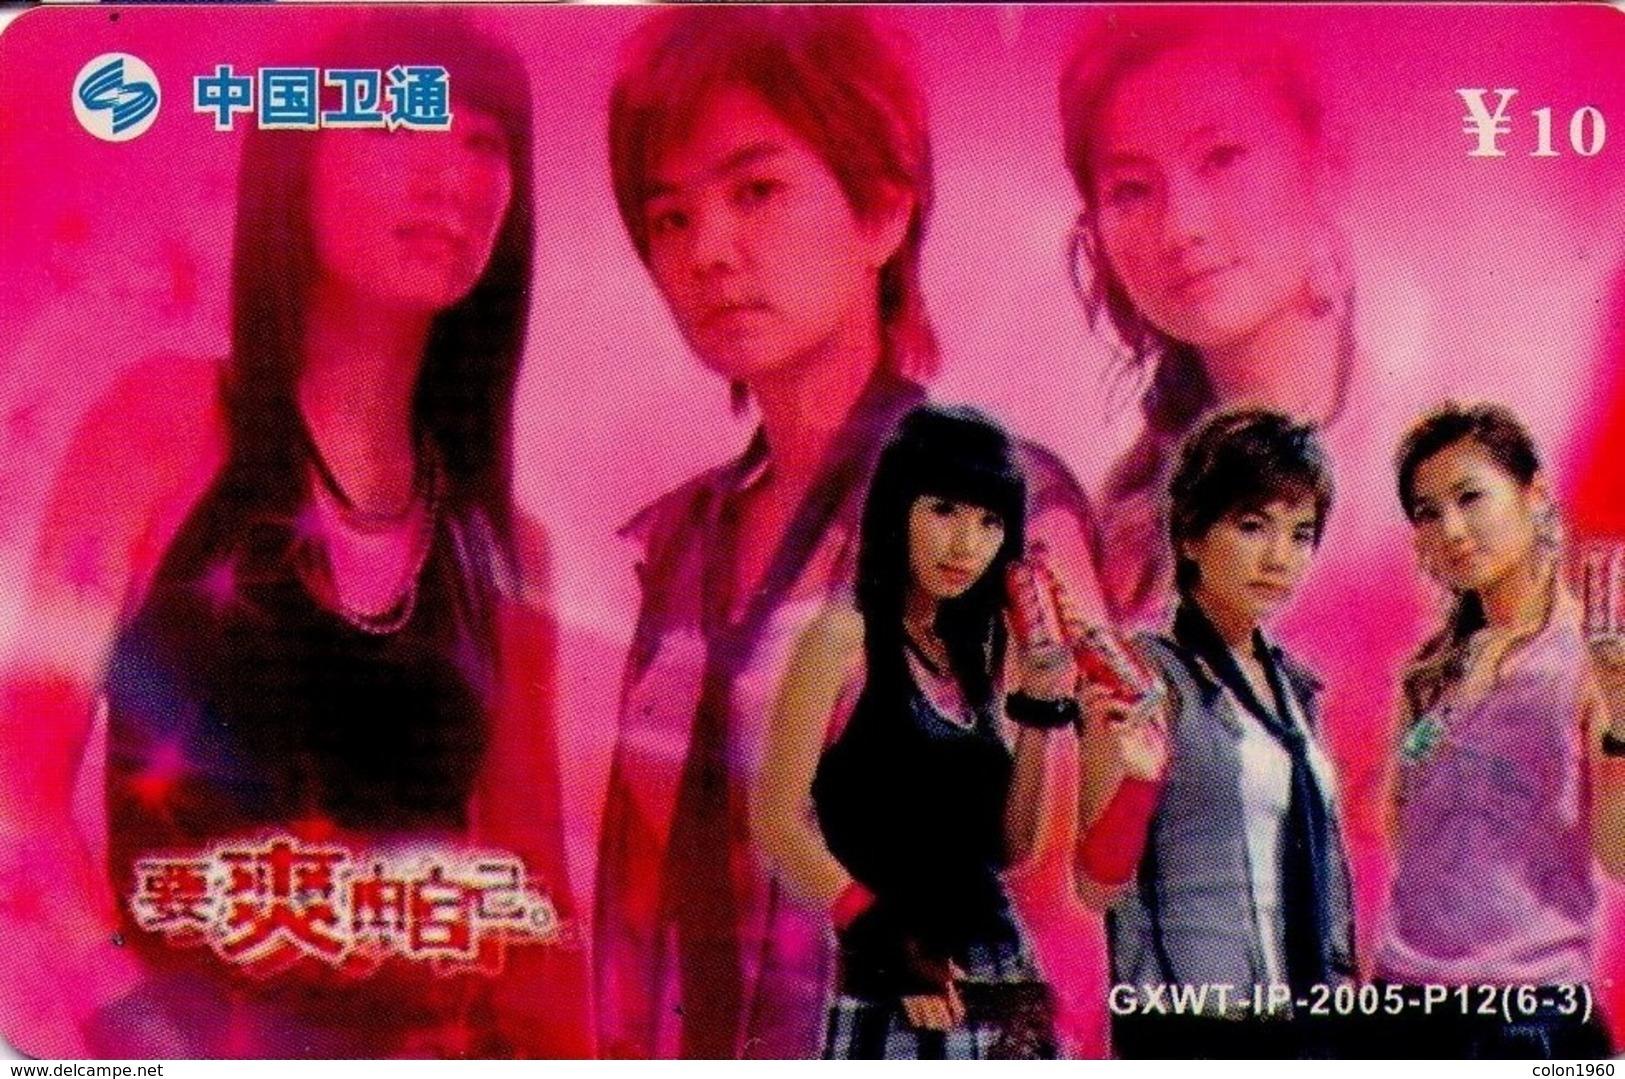 CHINA. COCA COLA - MUSICA - S.H.E. GXWT-IP-2005-P12(6-3). (729) - Musik